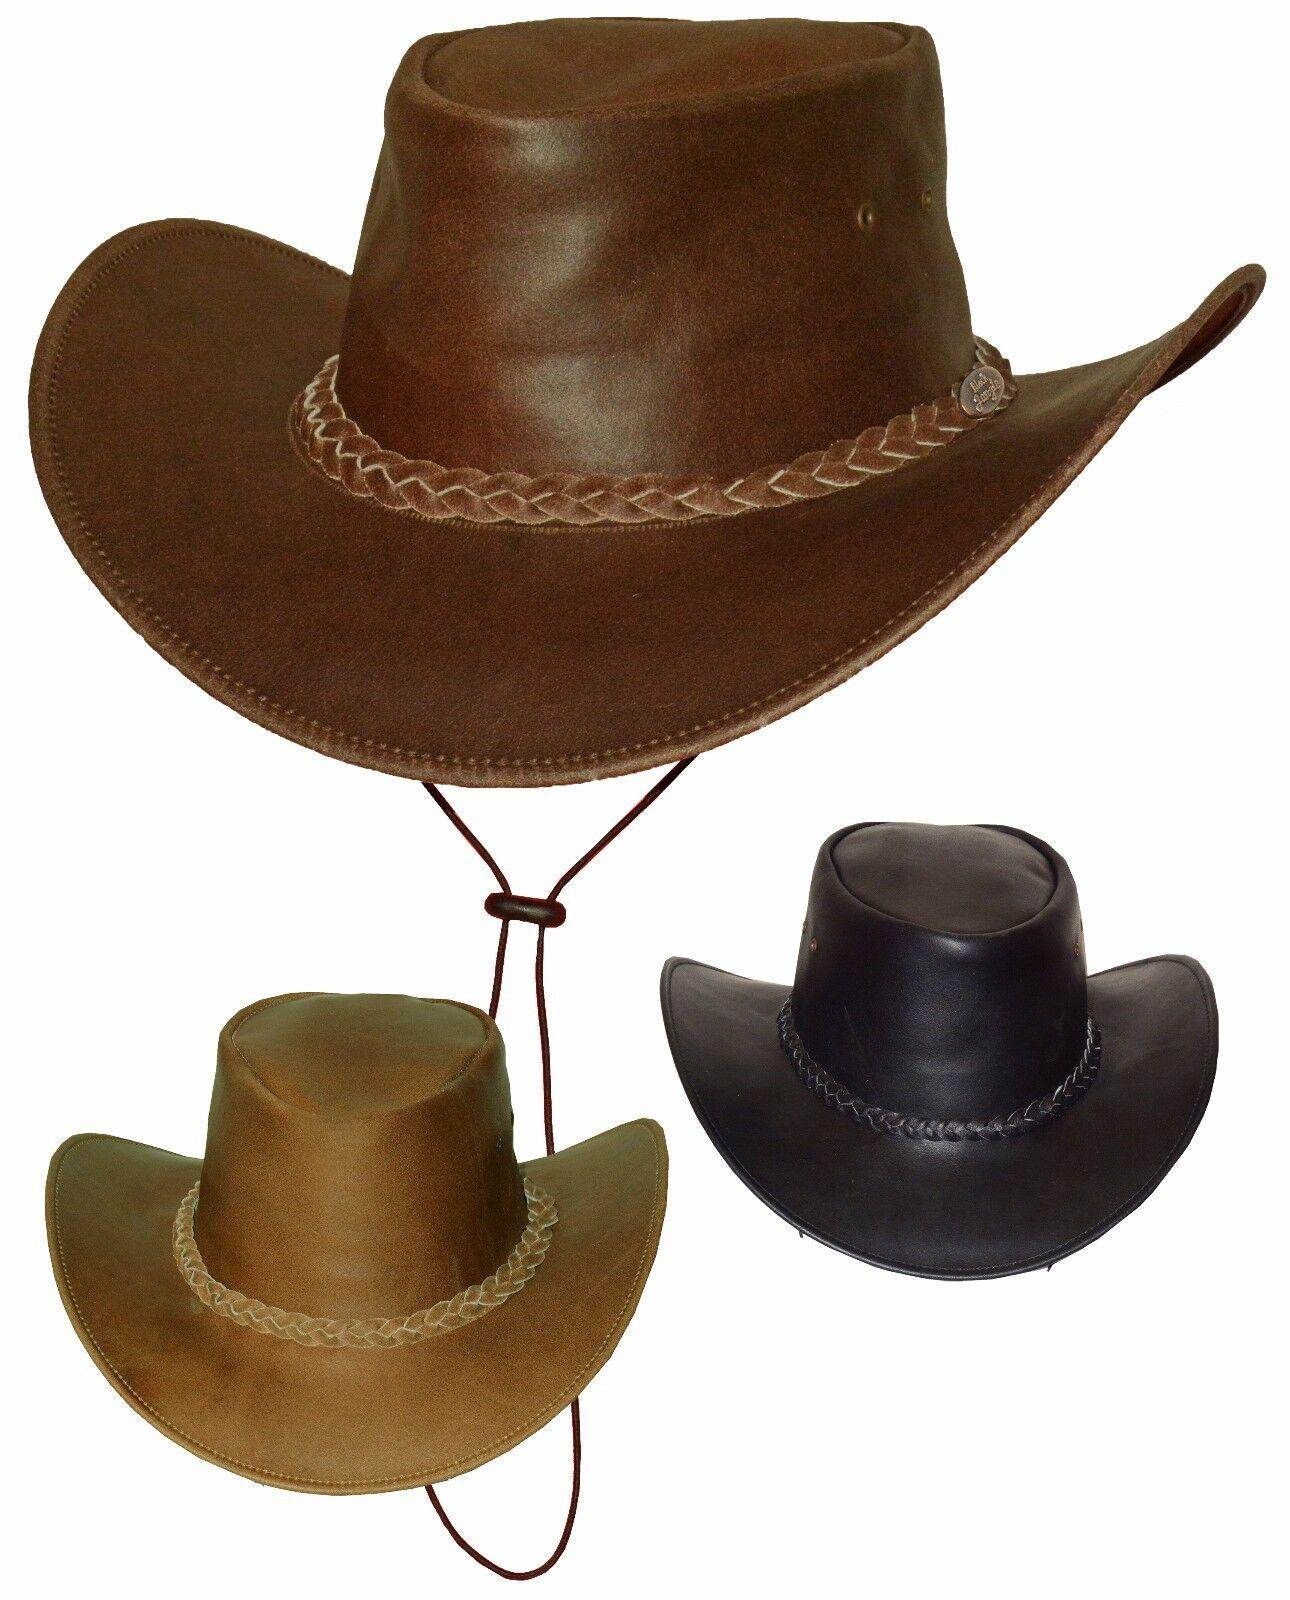 Black Jungle BROOME Australien Western Style Sonnenschutz  Lederhut Hut Hüte